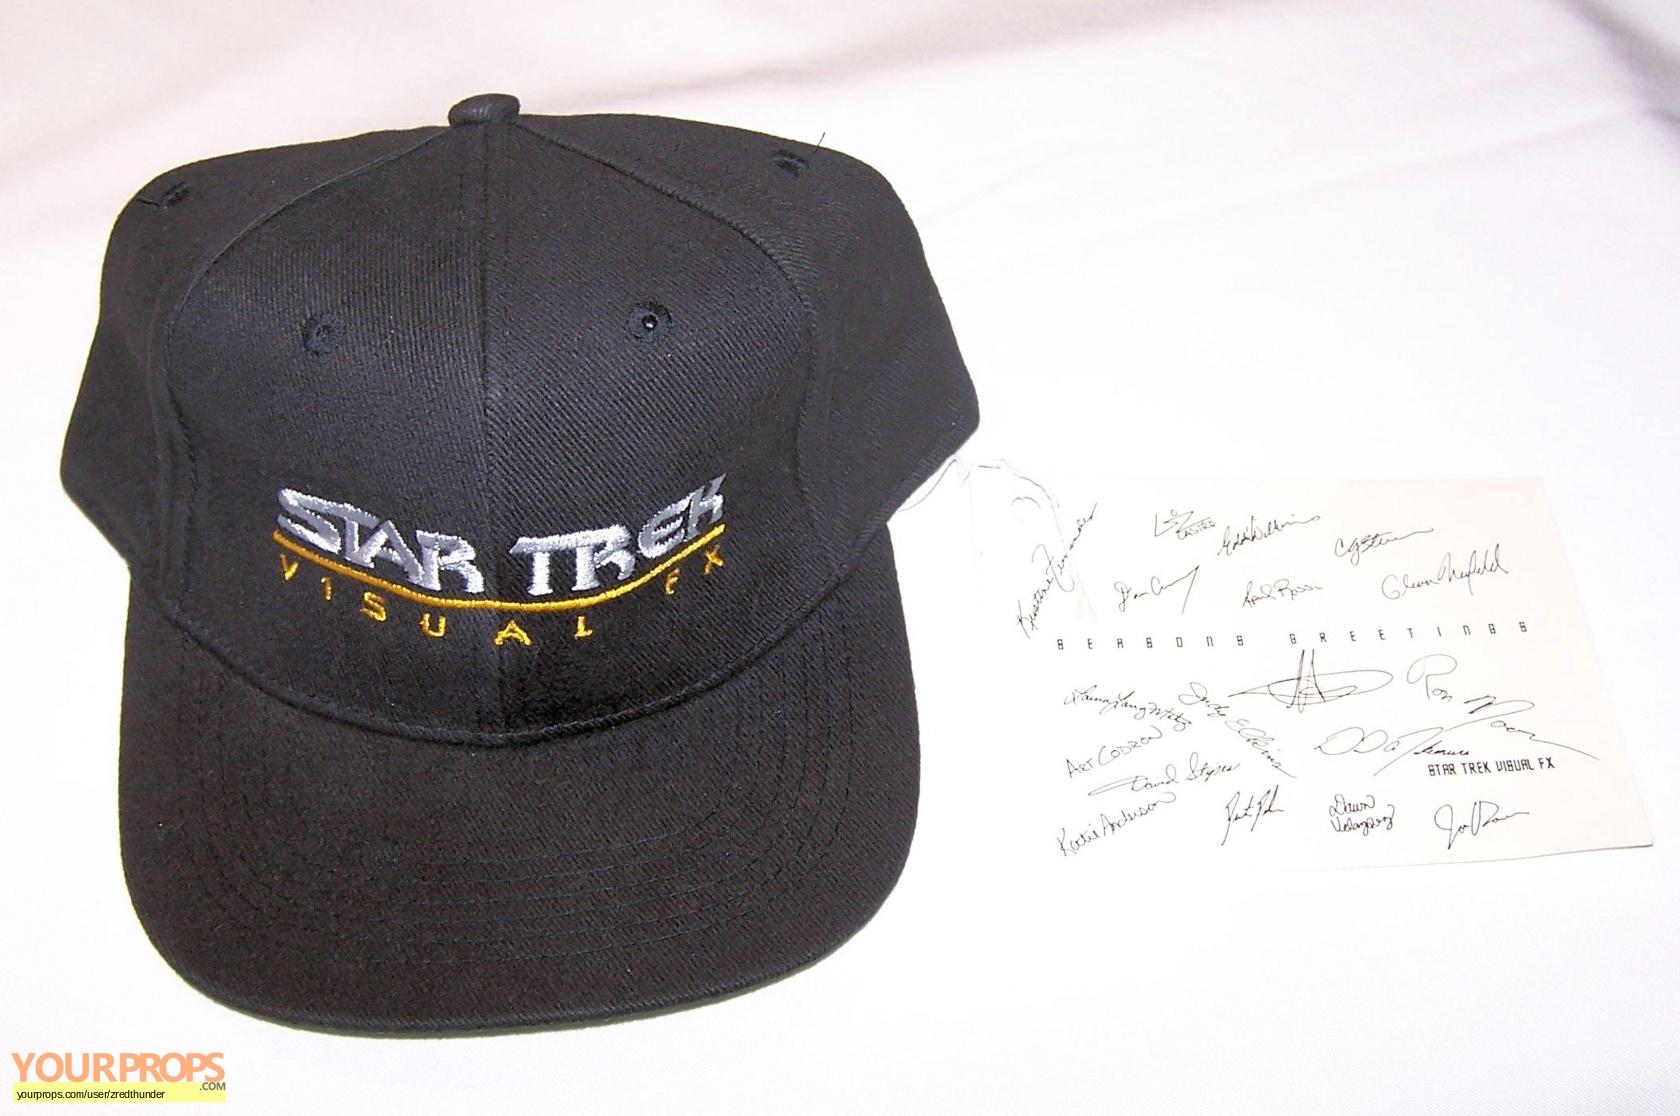 368e855e7b Star Trek: Deep Space Nine 1995-1996 Special FX Hat Crew Gift ...